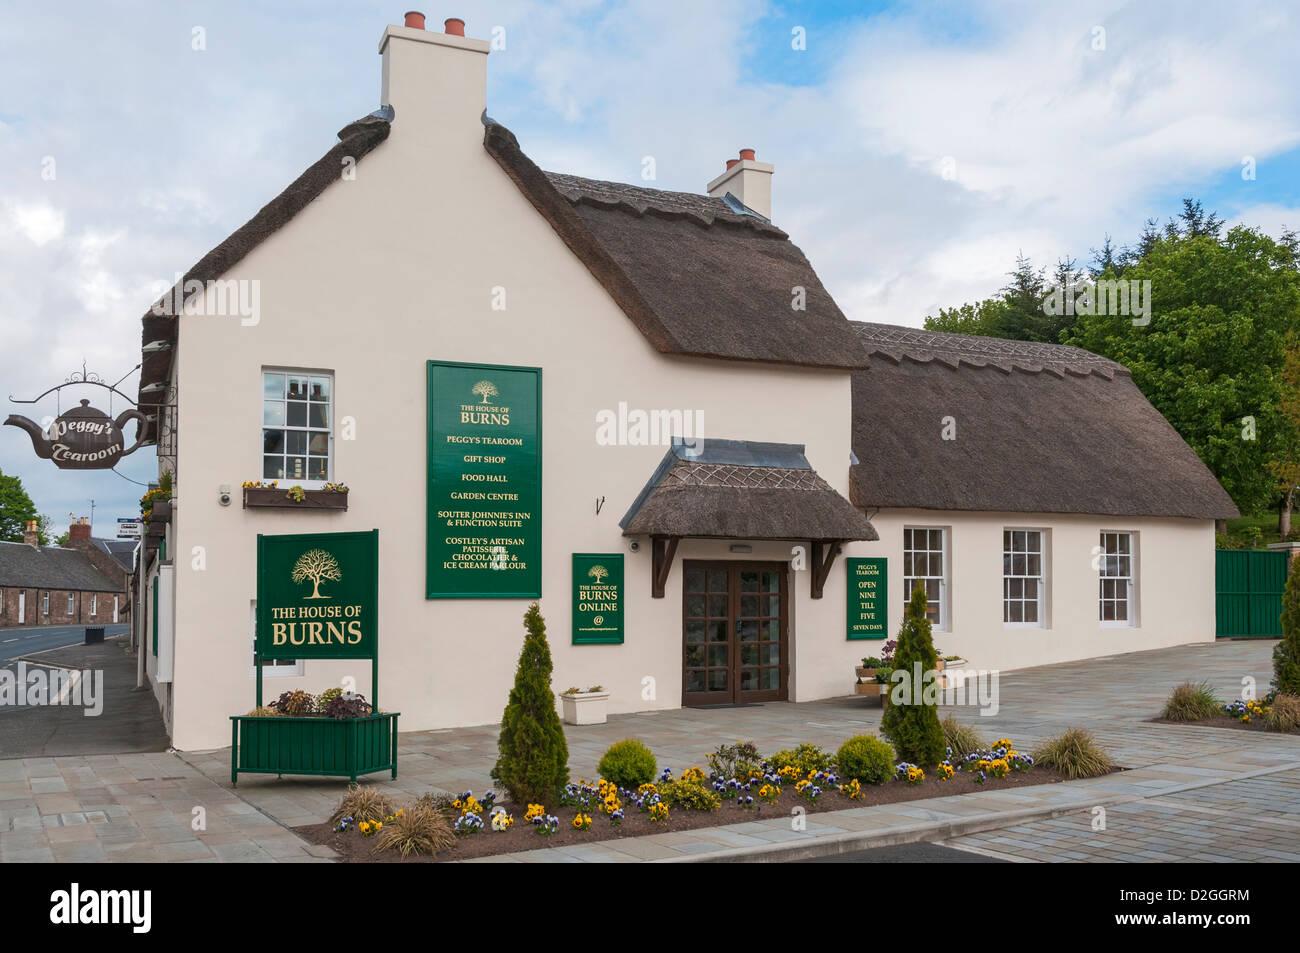 Scotland, Kirkoswald, The House of Burns, Peggy's Tearoom, restaurant, gift shop - Stock Image